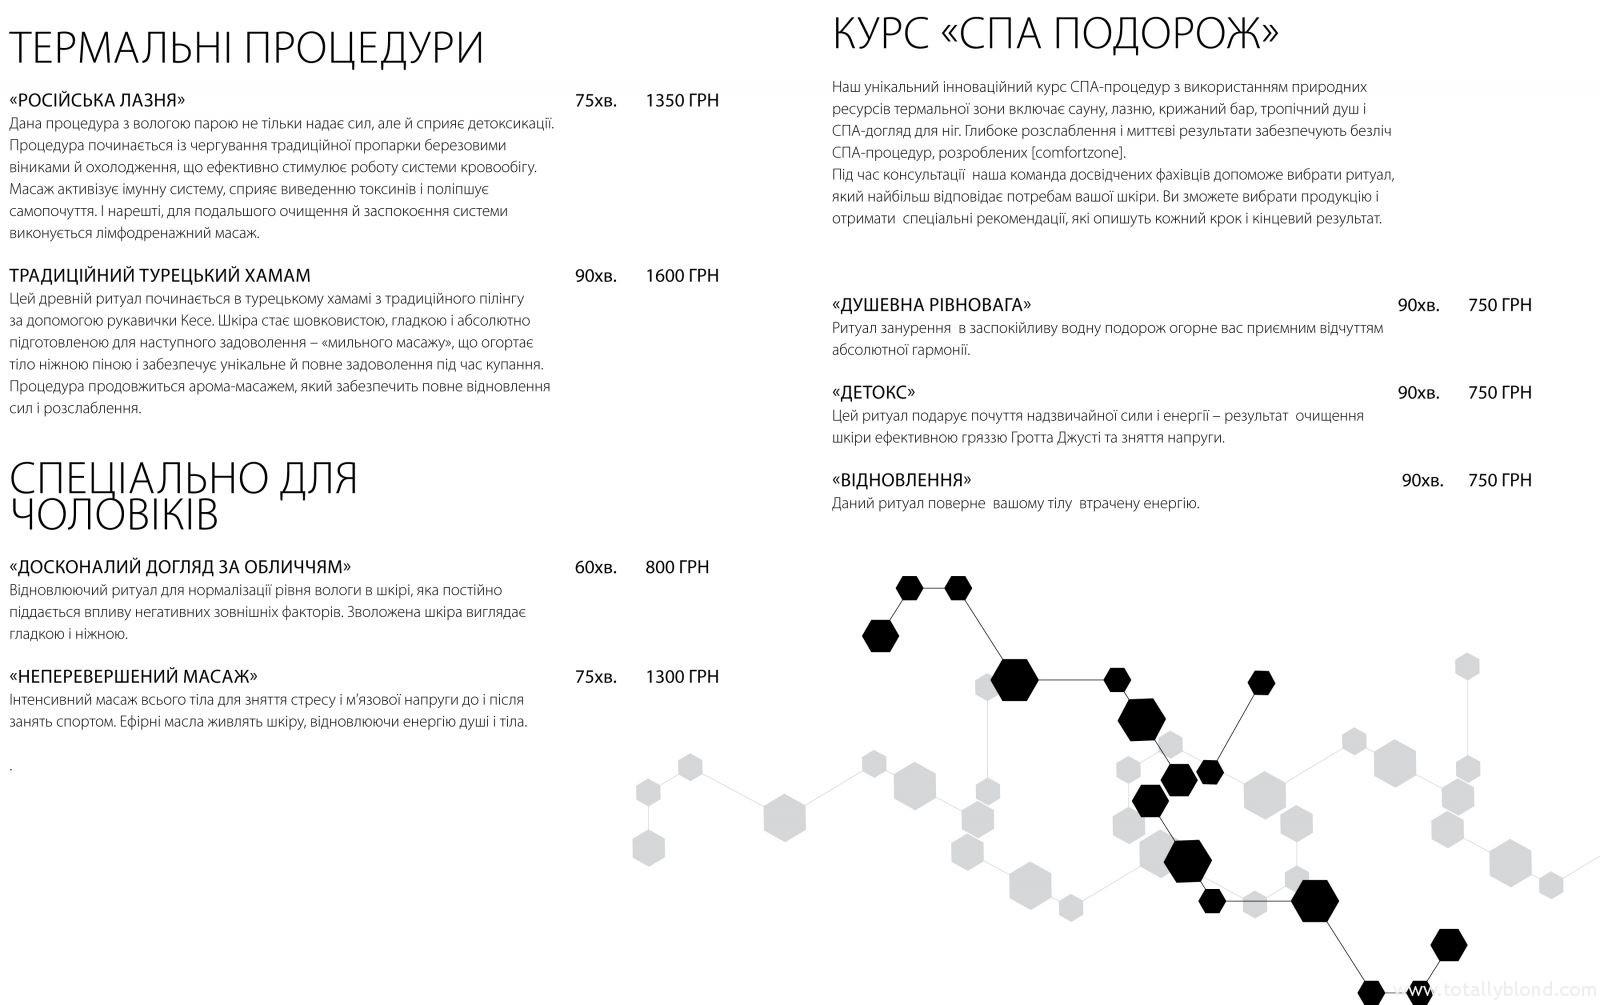 Hilton Kyiv Spa Menu - UA-5